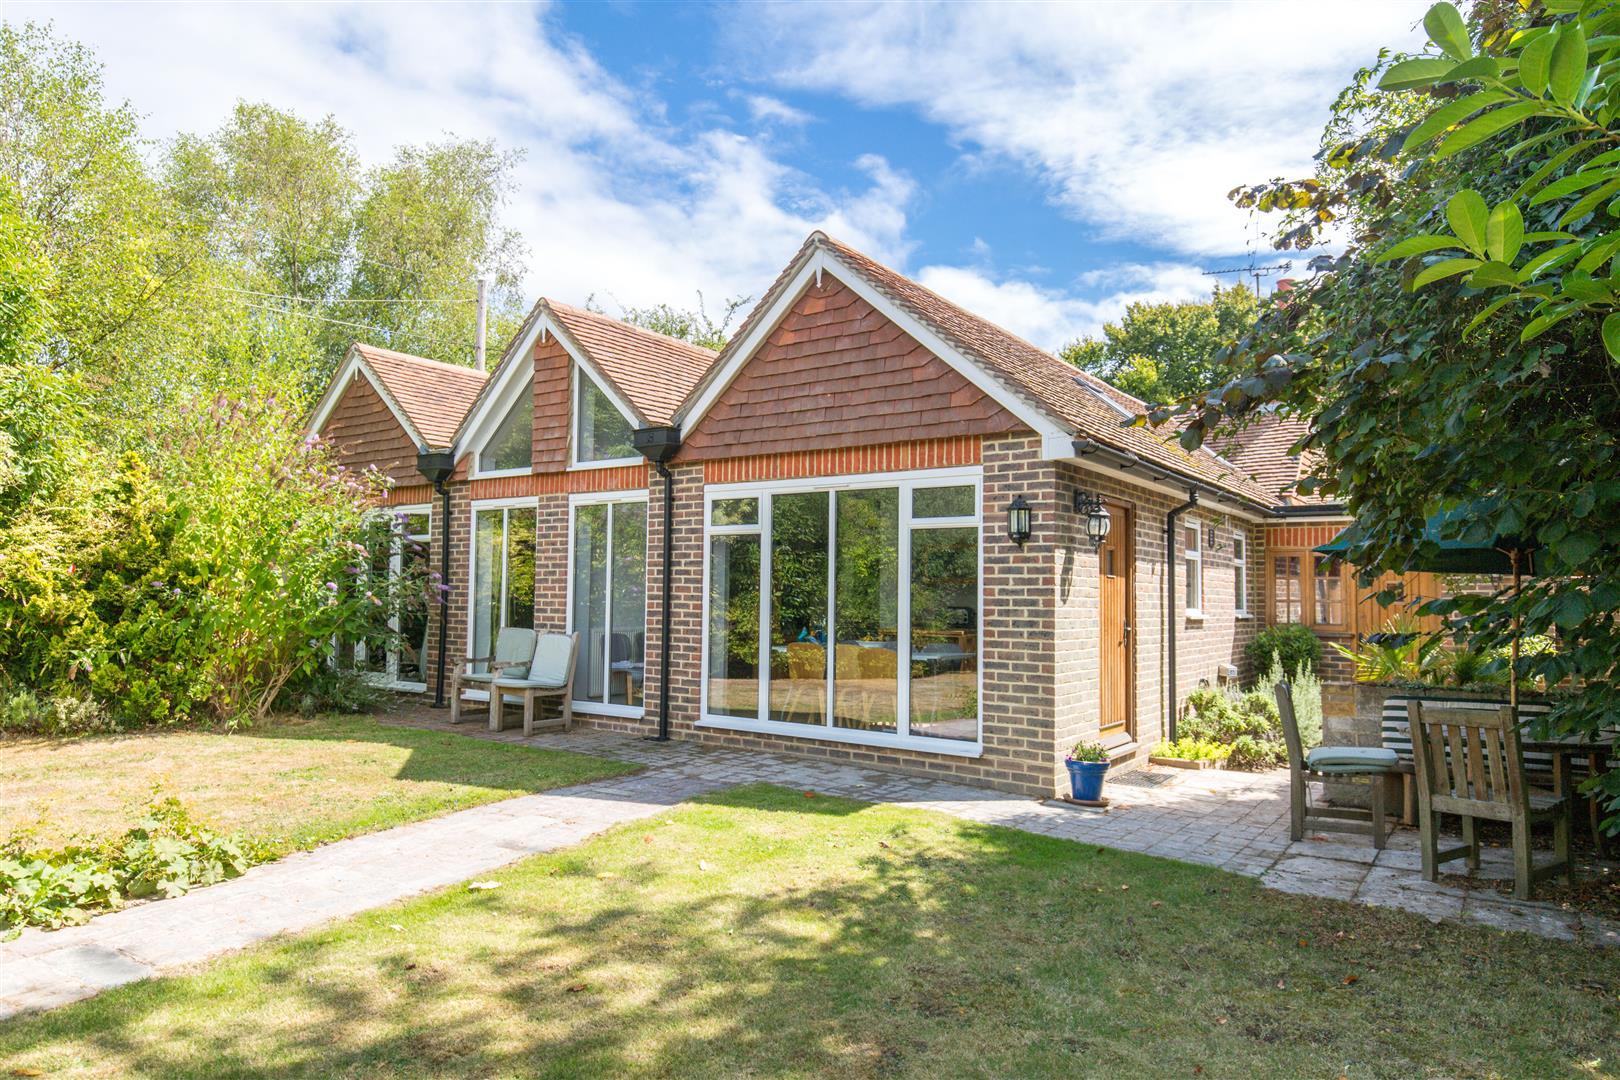 Caneheath Cottage Rear Aspect